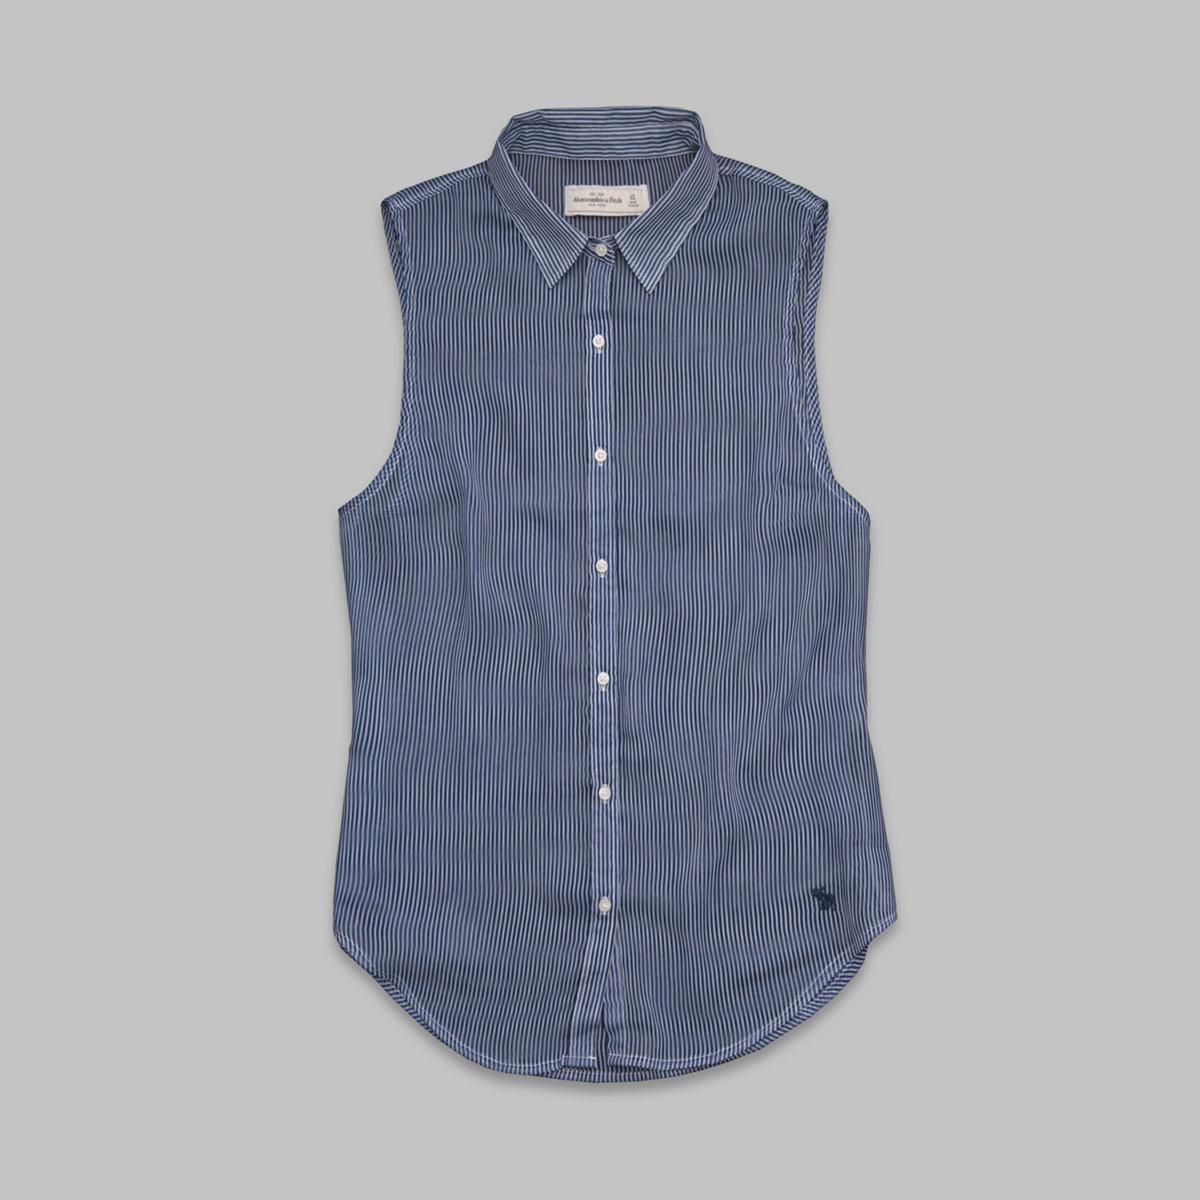 Evette Chiffon Shirt